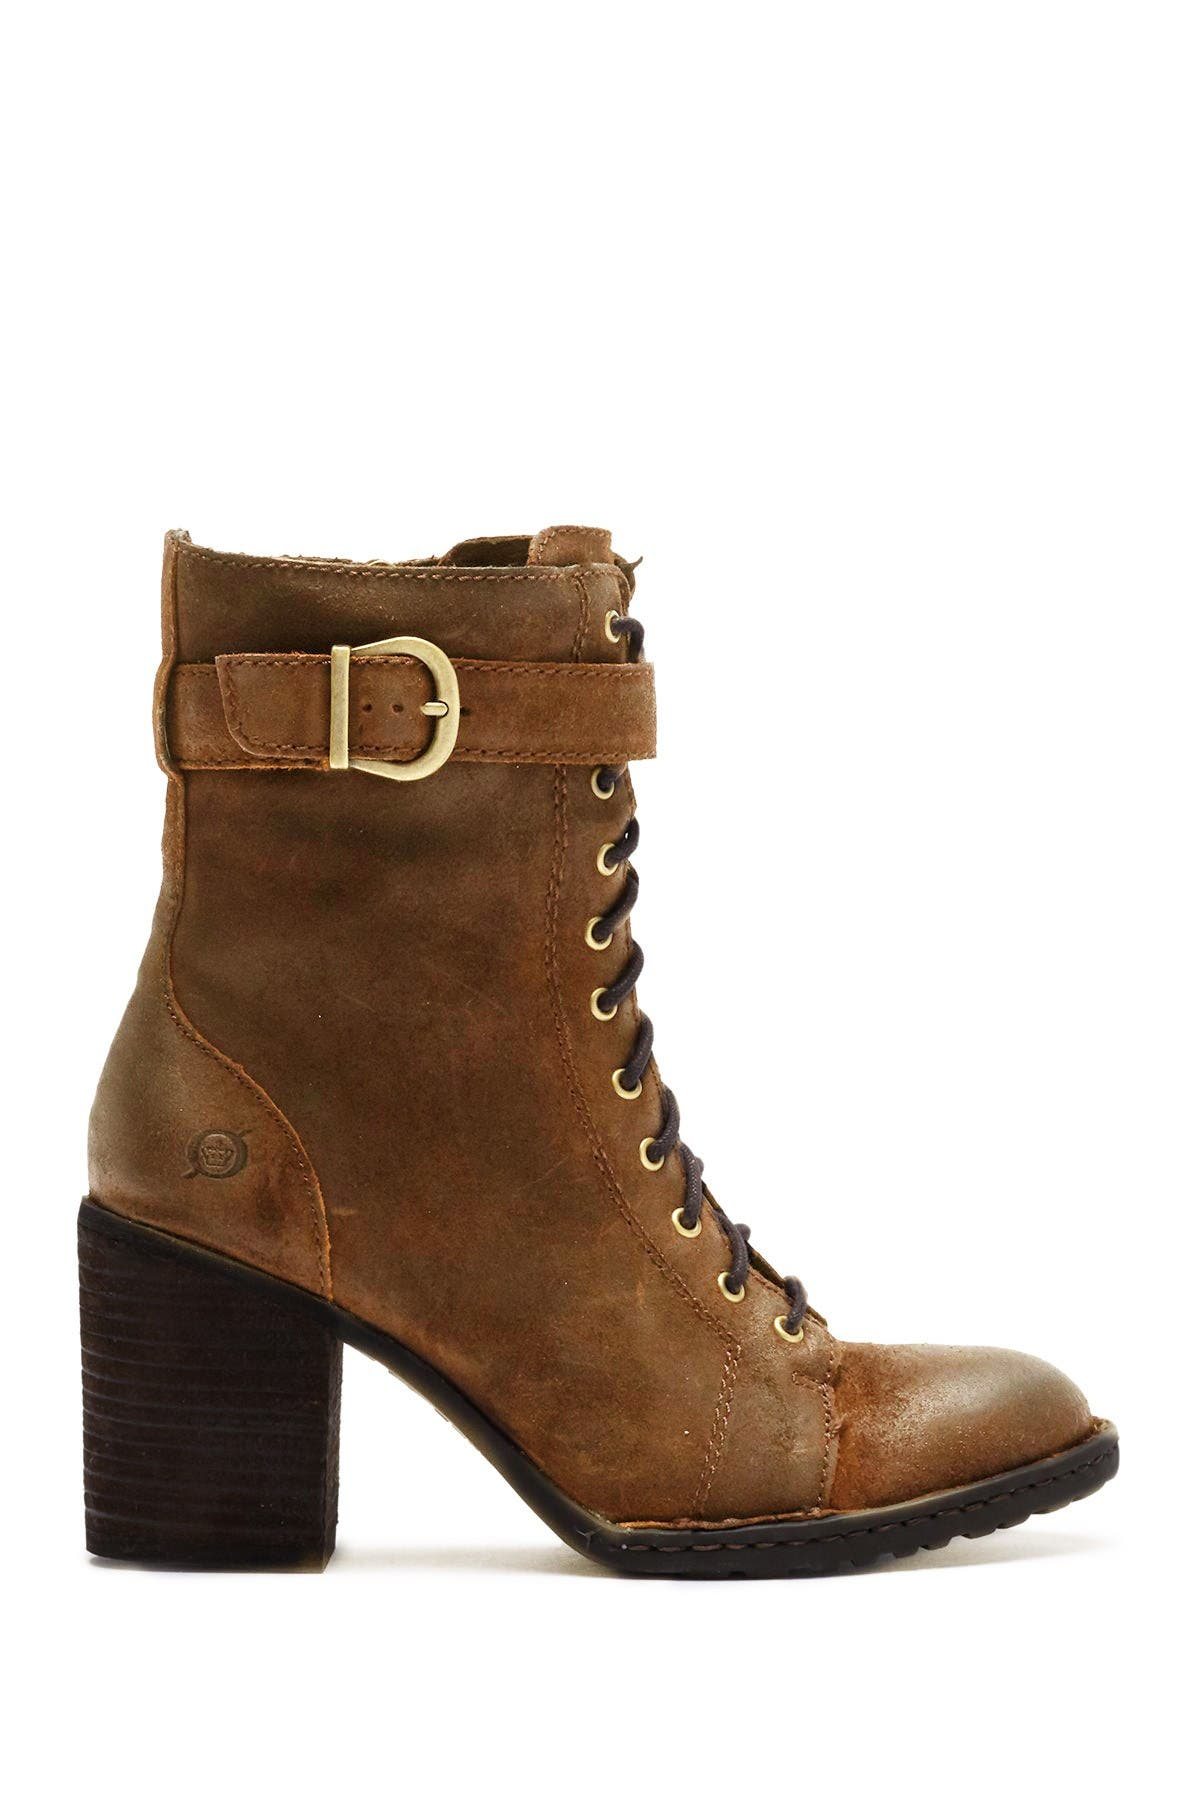 suede stacked heel boots